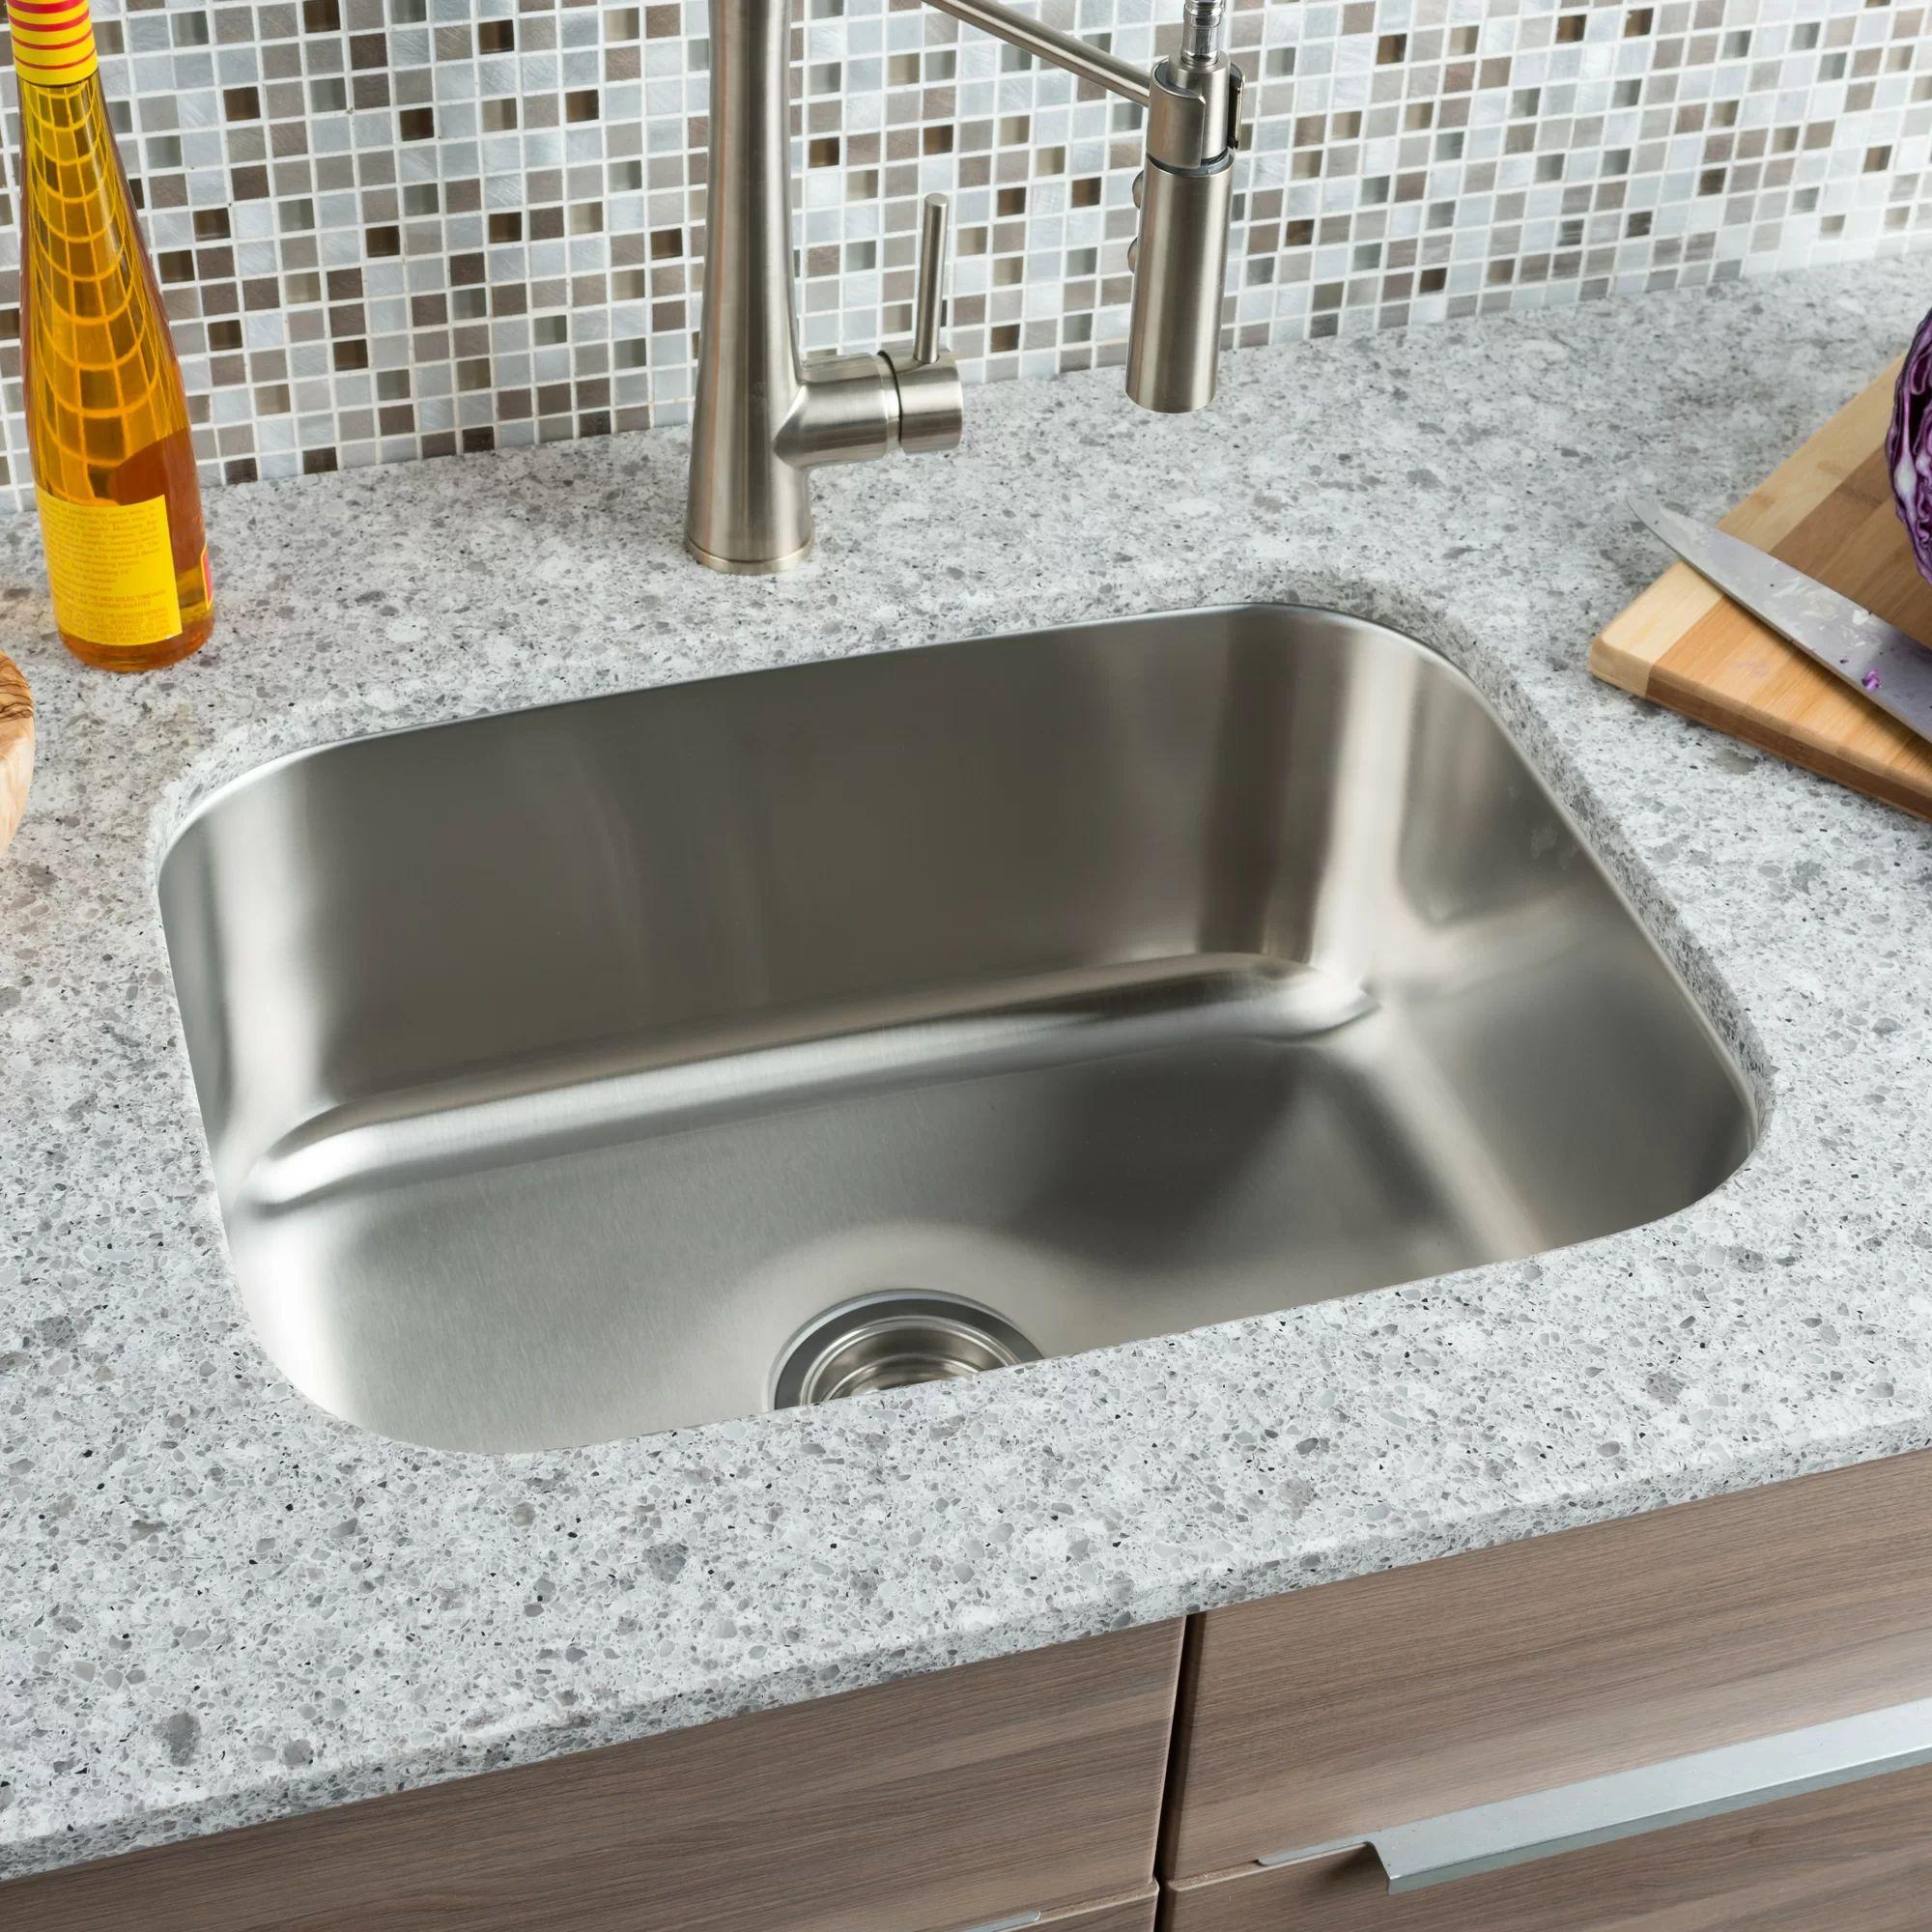 Cast iron single bowl kitchen sink - Single Bowl Cast Iron Kitchen Sink Cast Iron Single Bowl Kitchen Sink Classic Chef 23